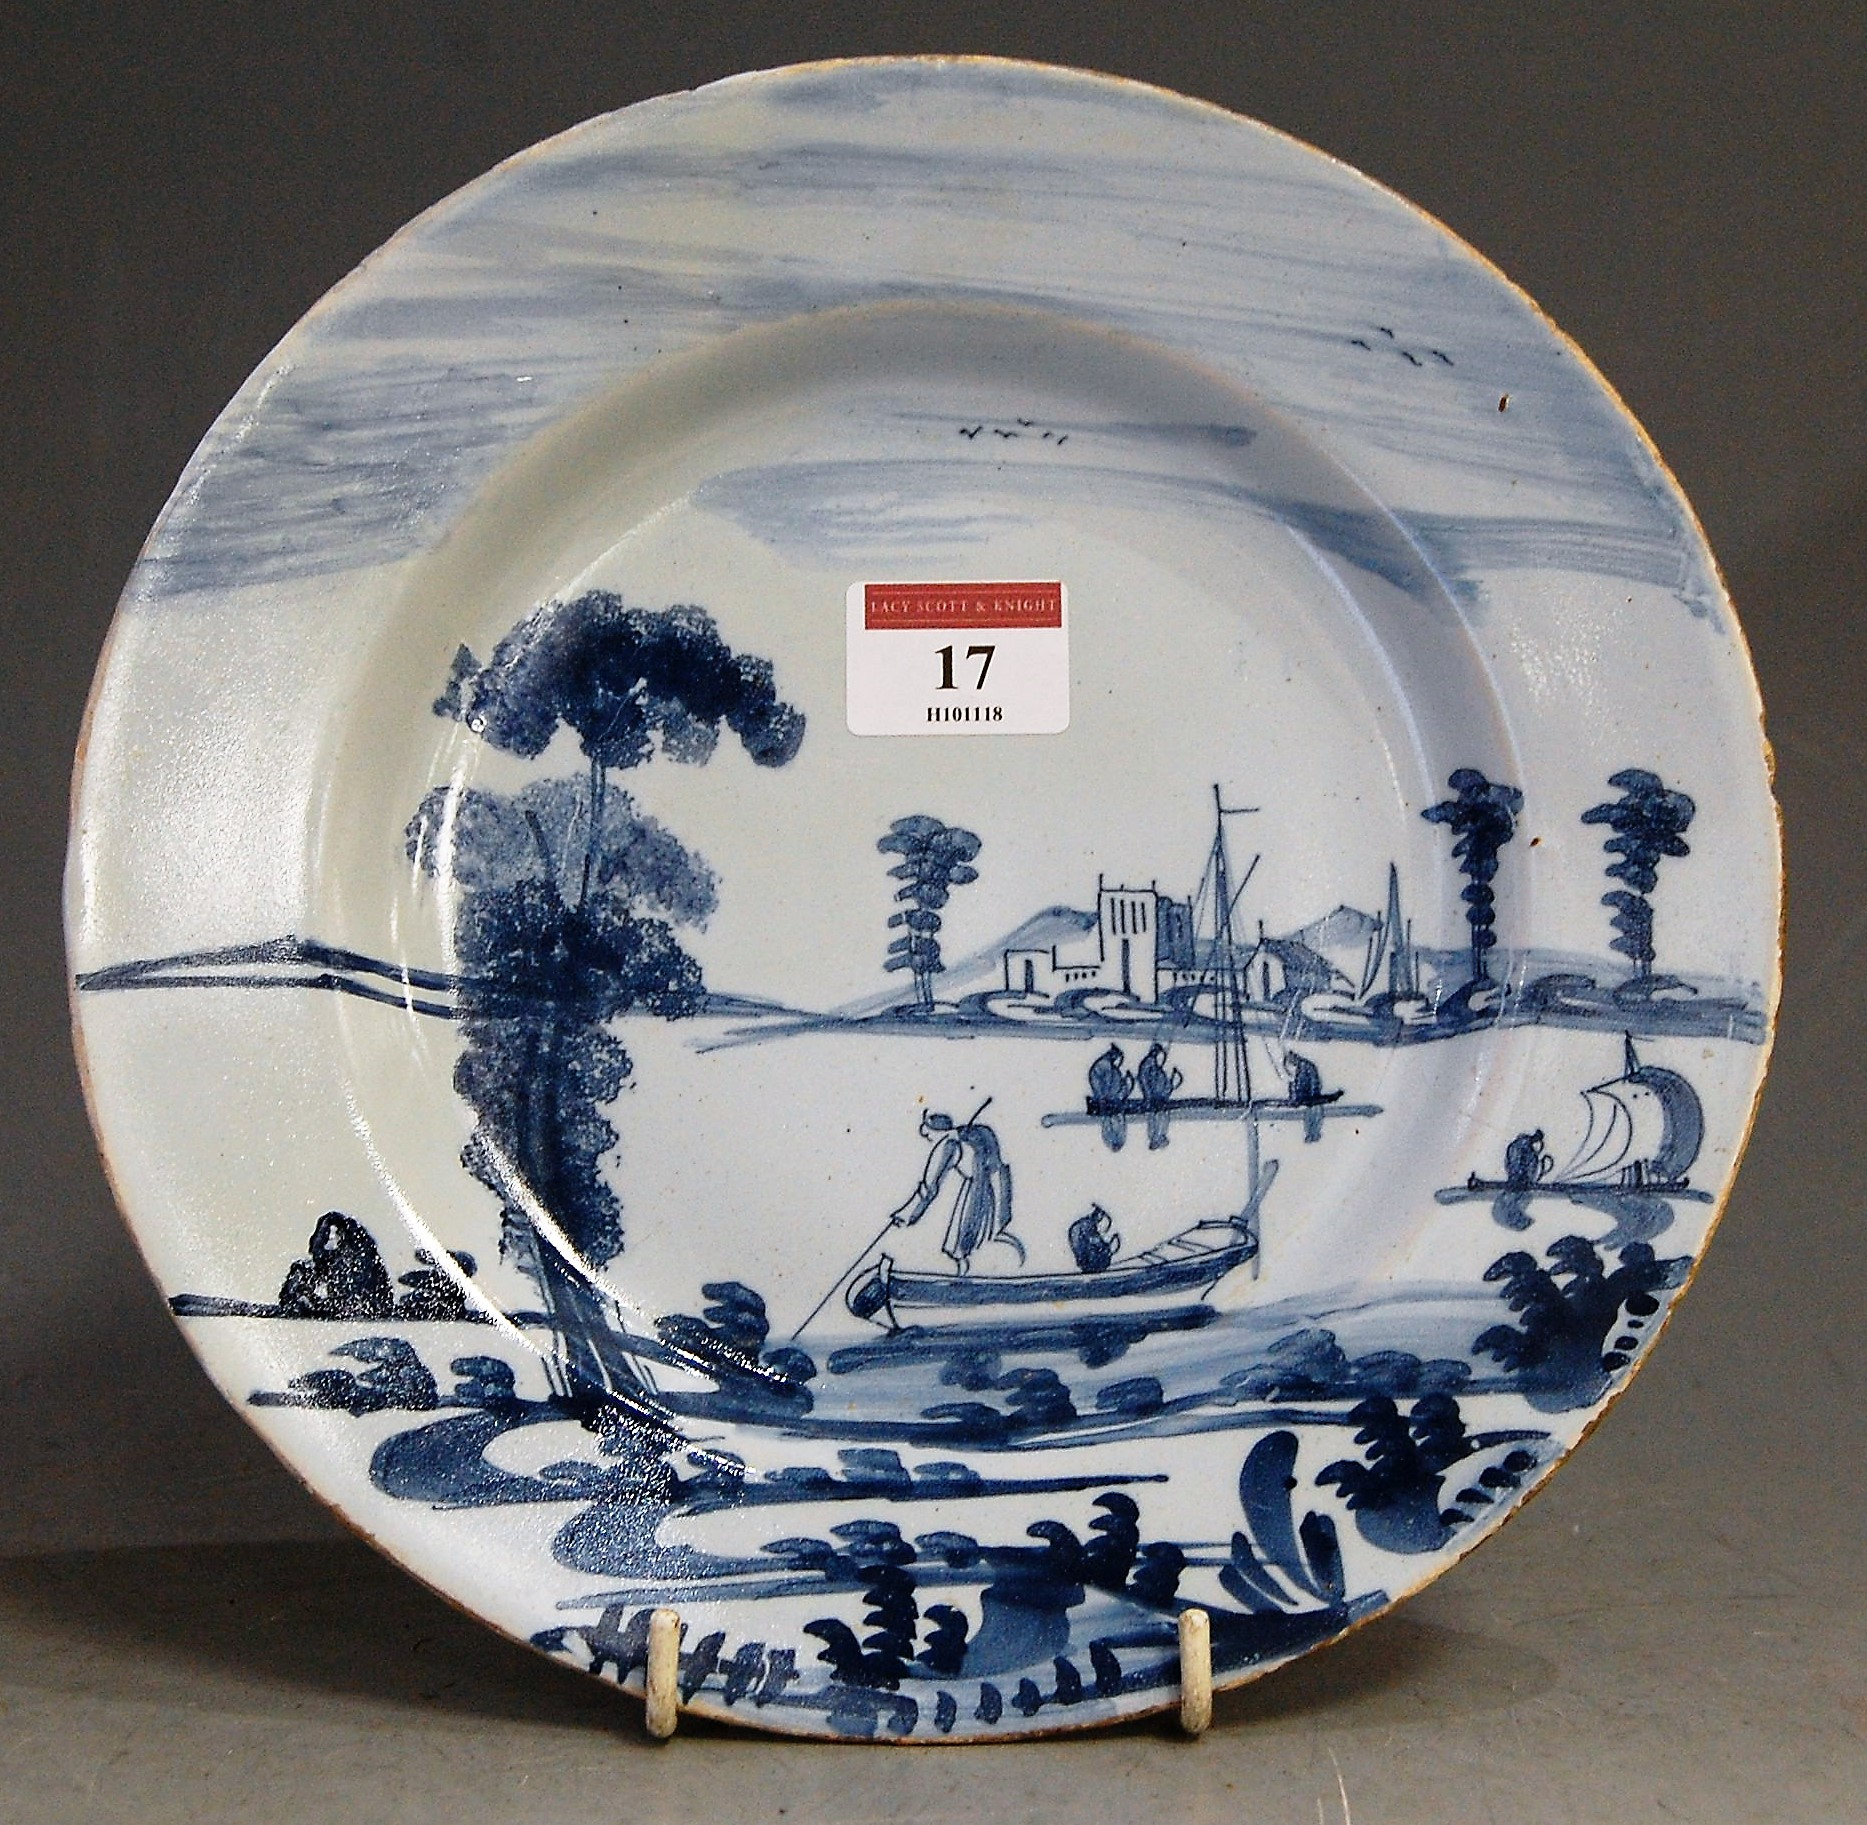 Lot 17 - An 18th century Dutch delft blue and white plate, depicting figures amidst river landscape (